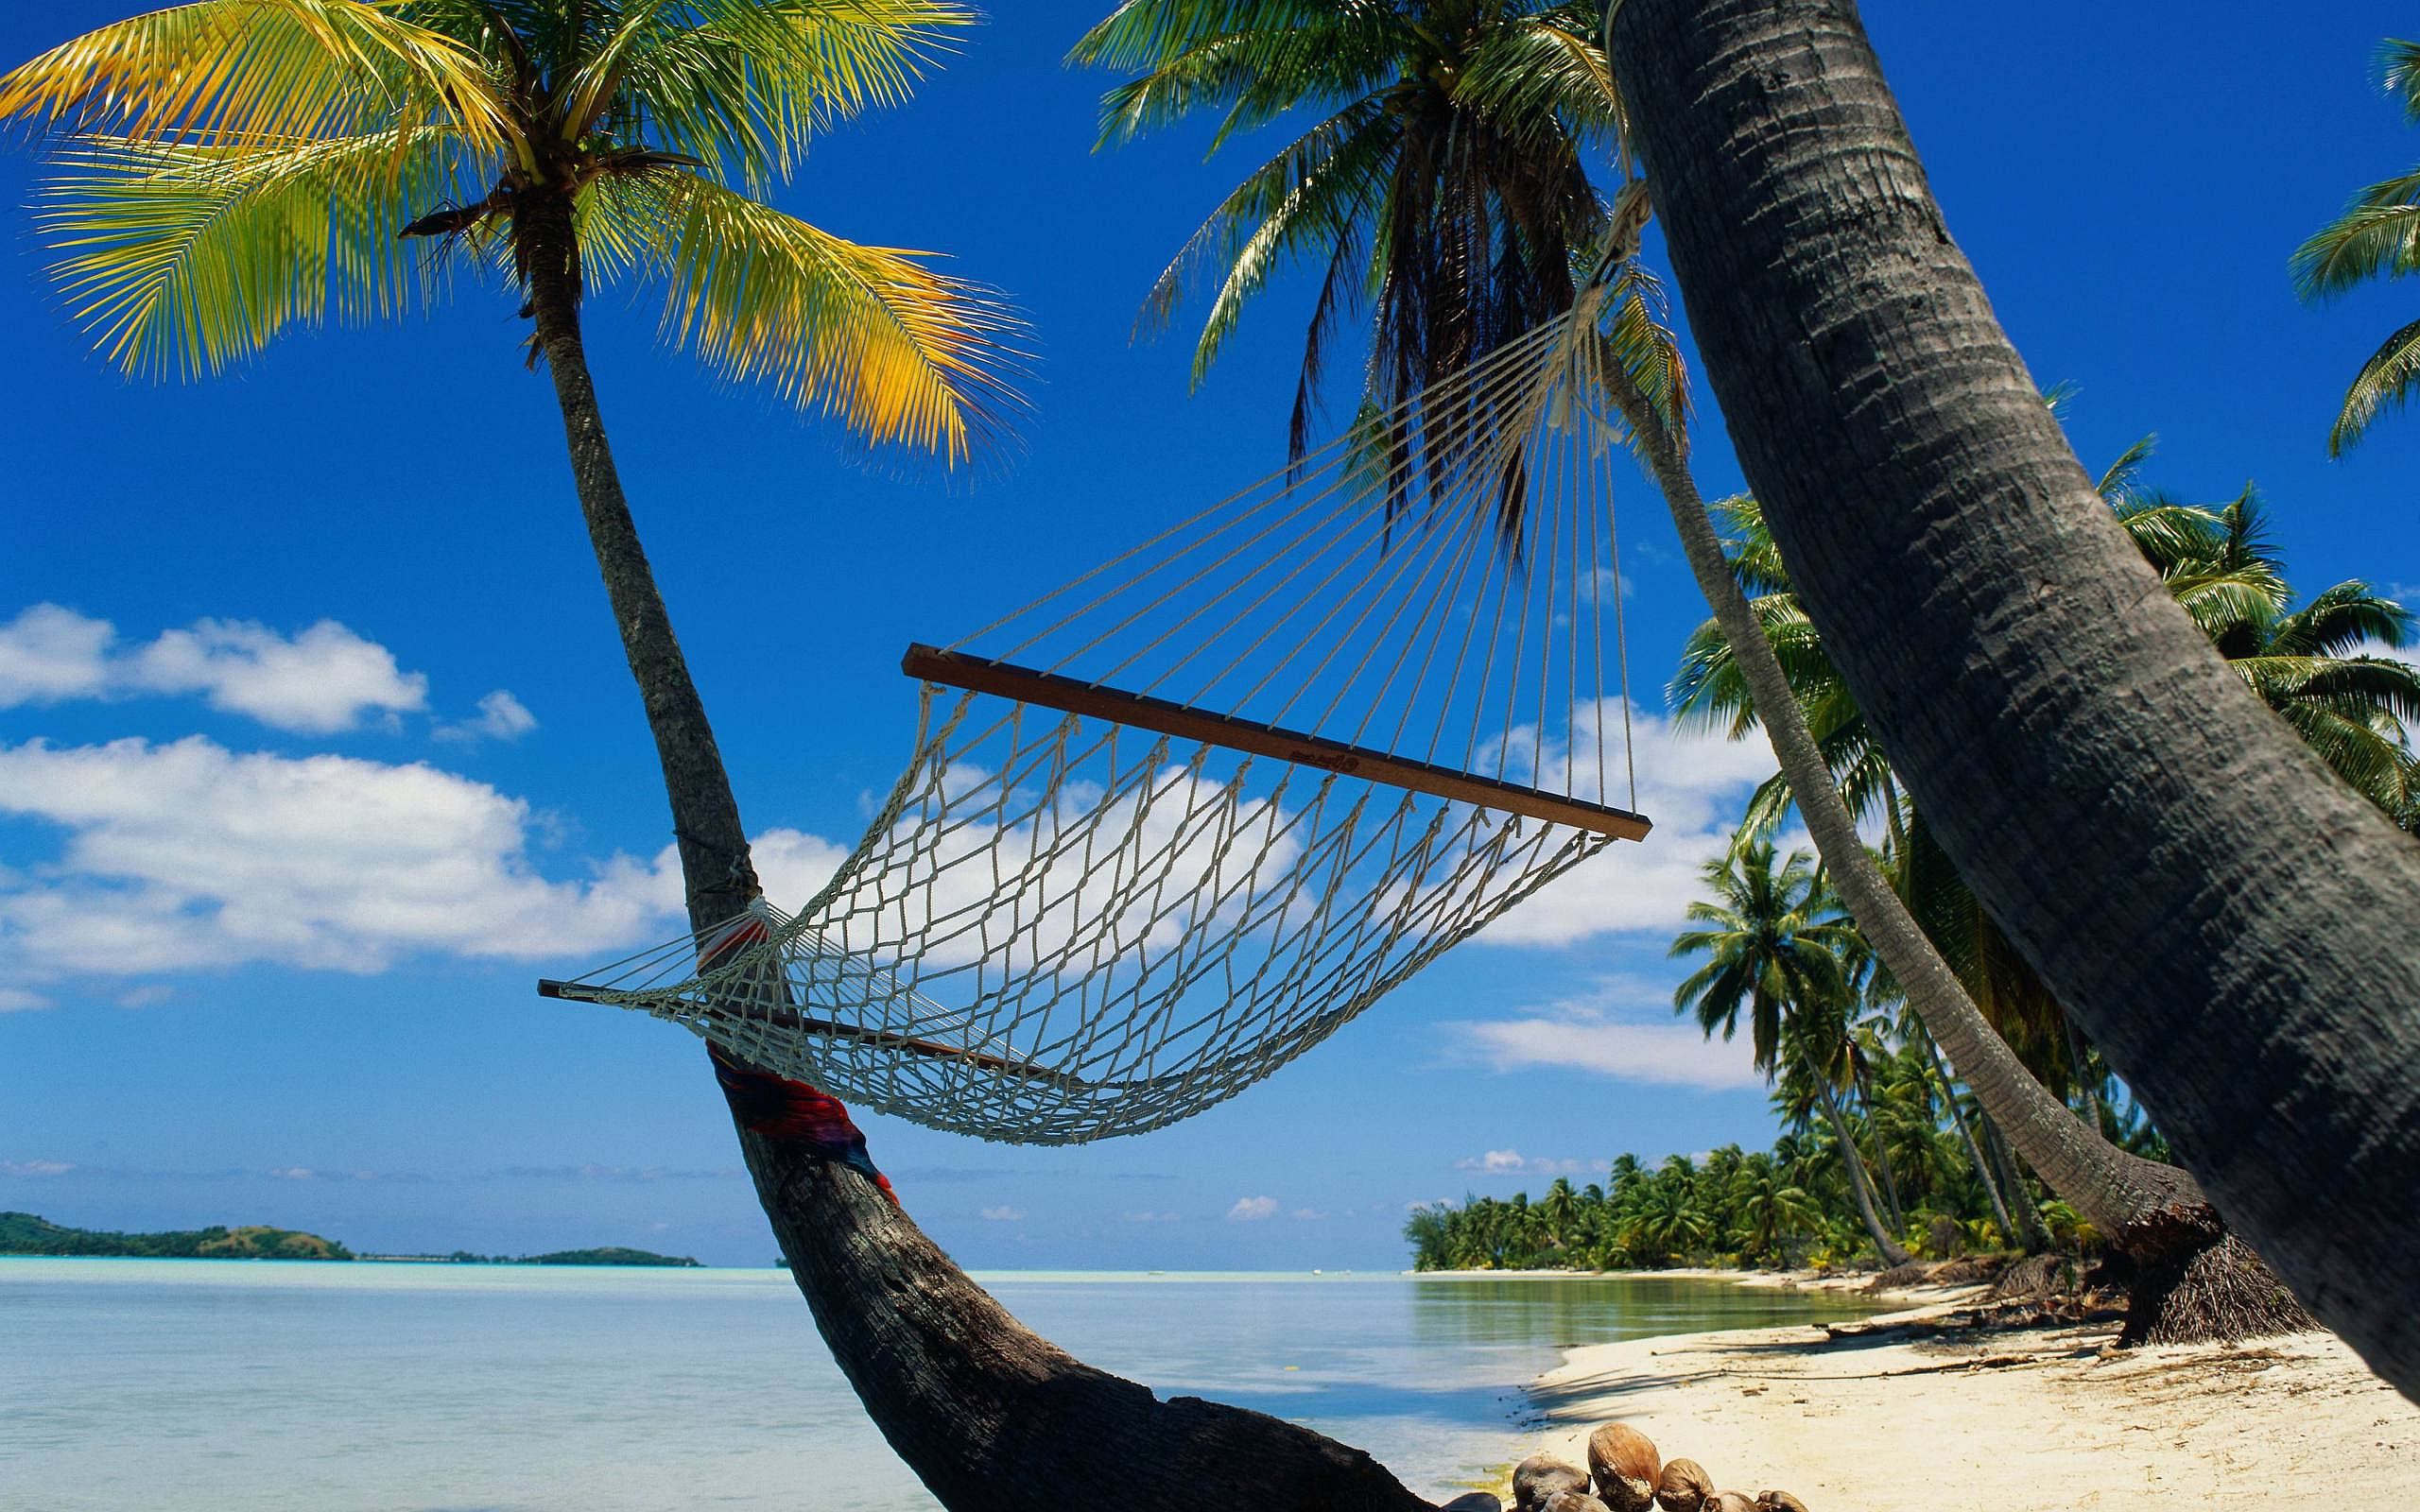 Beach Hammock Palms